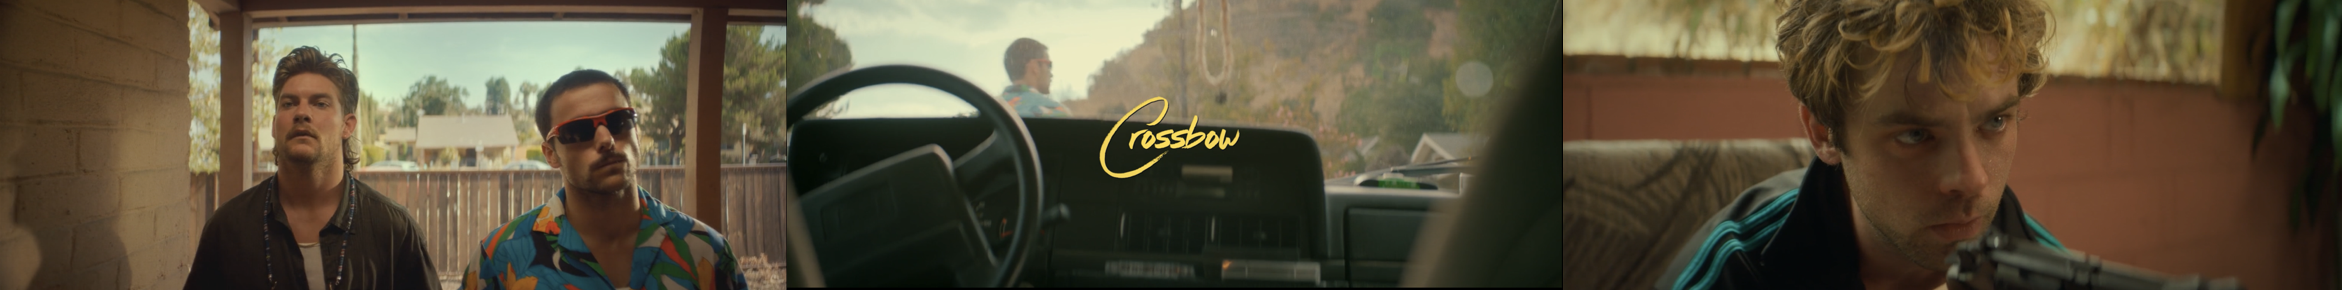 """Crossbow"" - Dir. Zach Lasry"